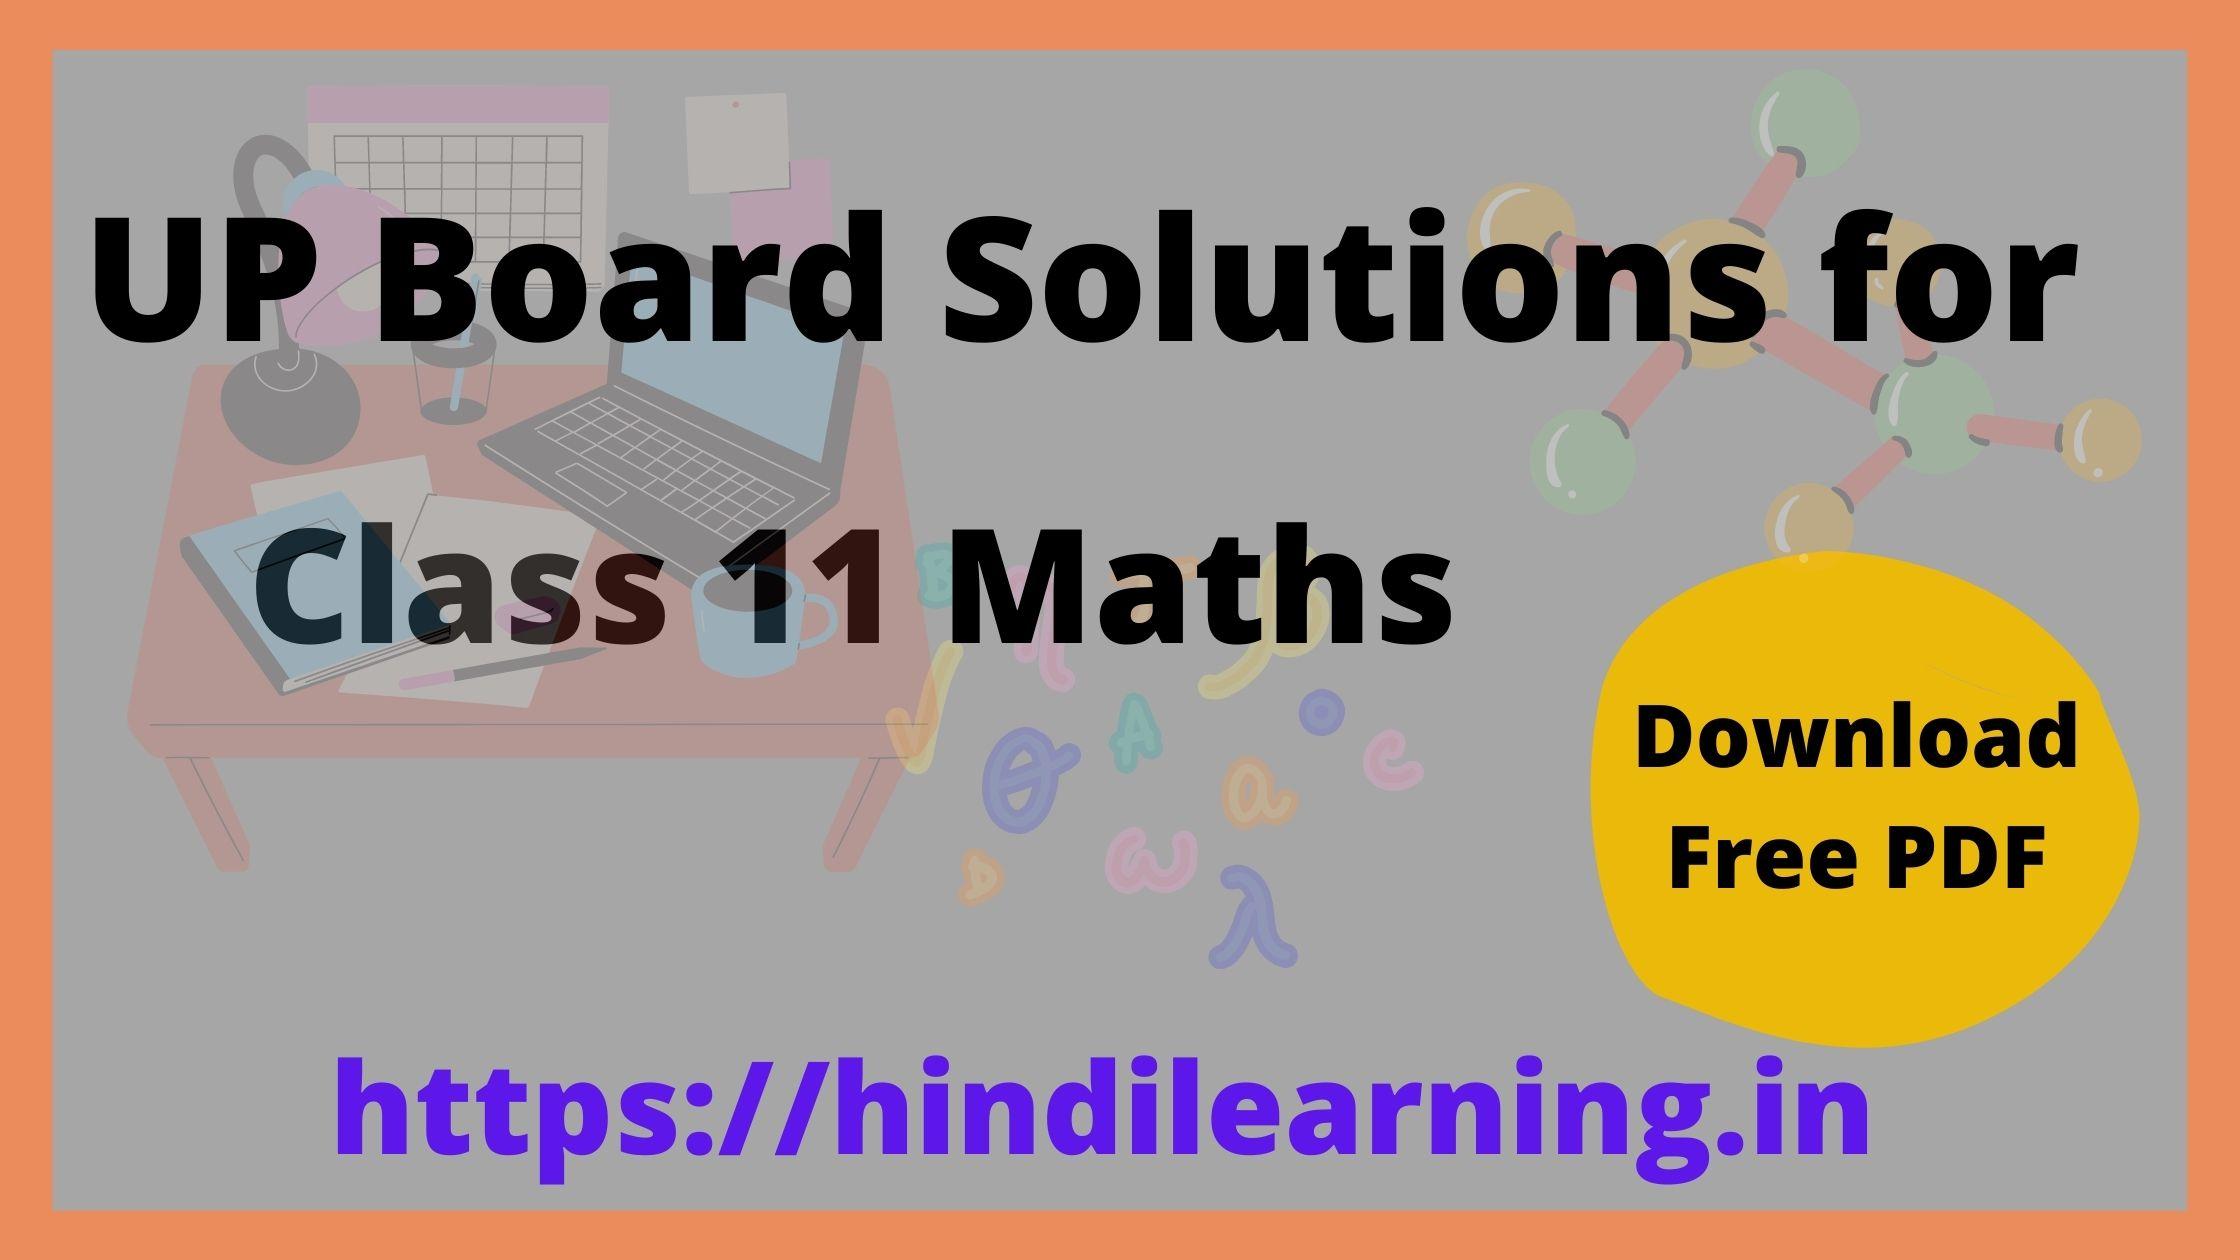 UP Board Solutions for Class 11 Maths Hindi Medium